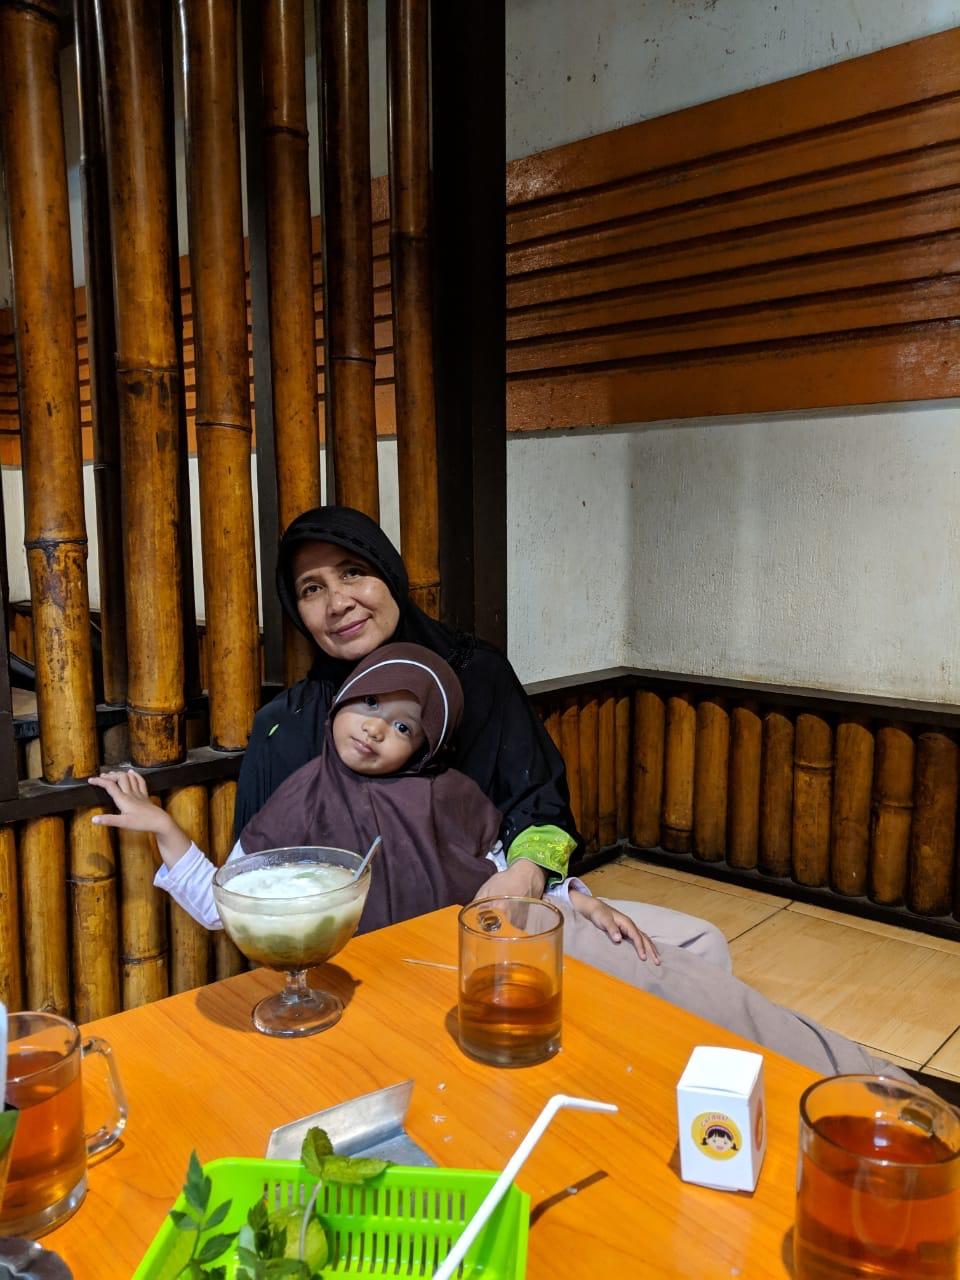 Tempat Makan Favorit Untuk Buka Puasa Di Cimahi